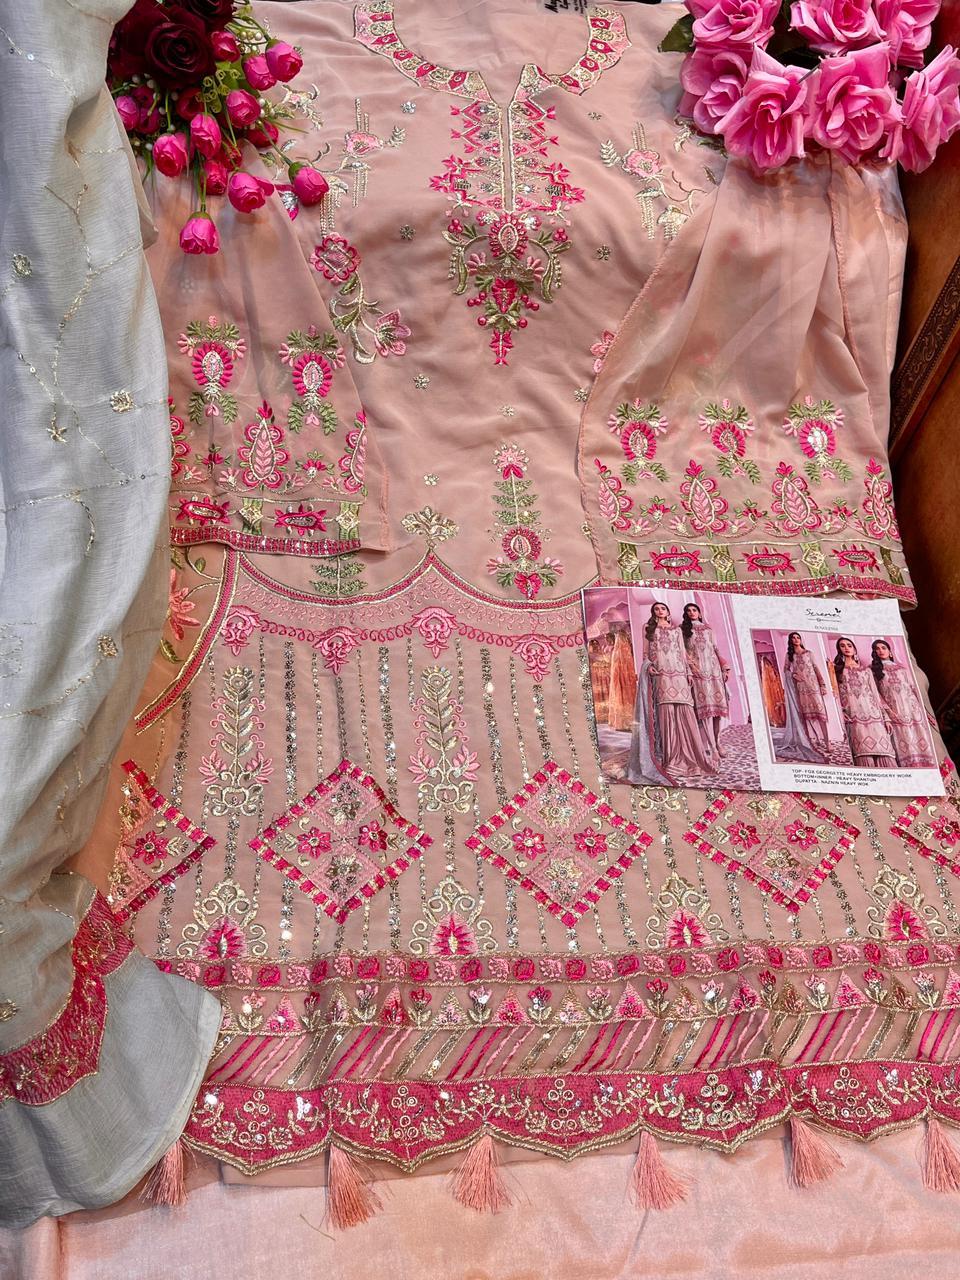 Serene Iznik Salwar Suit Wholesale Catalog 5 Pcs 9 - Serene Iznik Salwar Suit Wholesale Catalog 5 Pcs